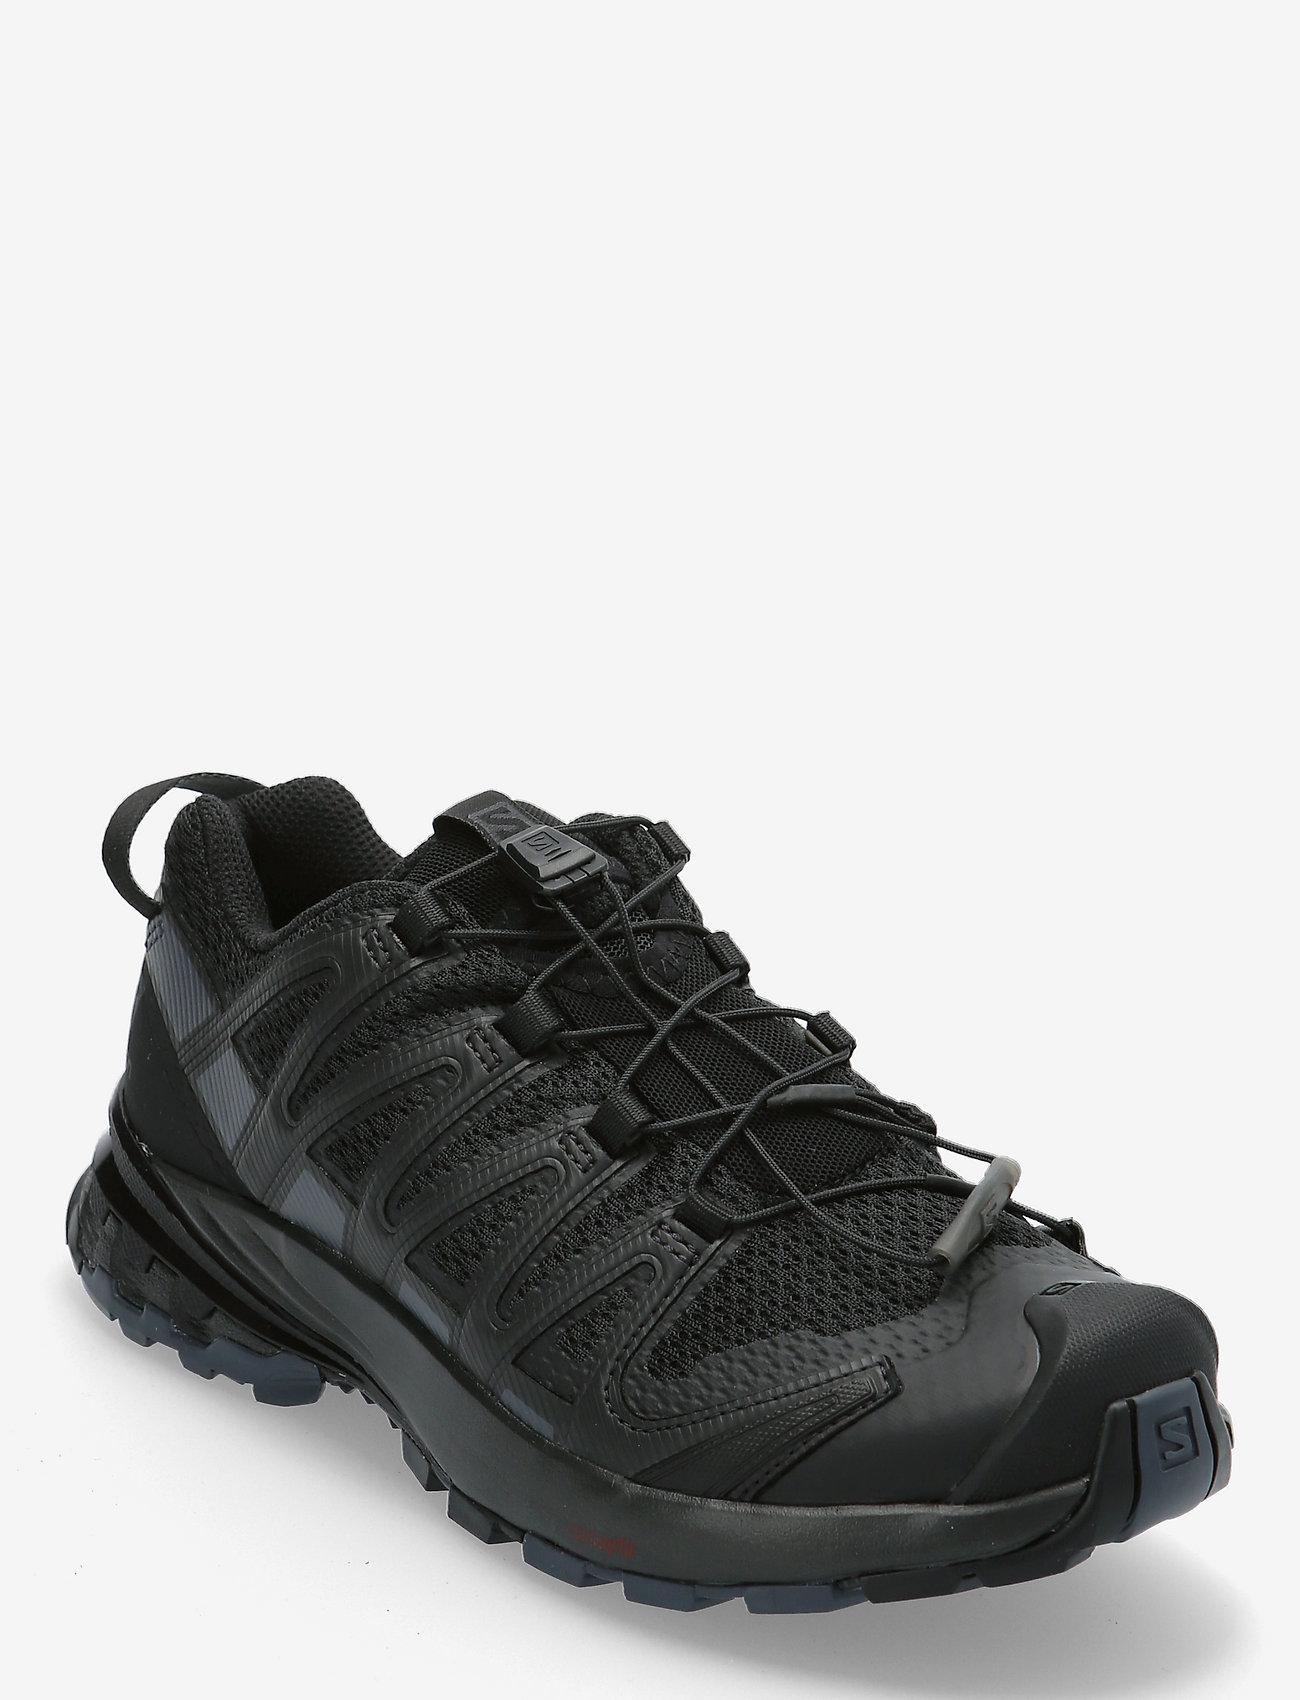 Salomon - XA PRO 3D v8 W Black/Phantom/Ebony - wanderschuhe - black - 0